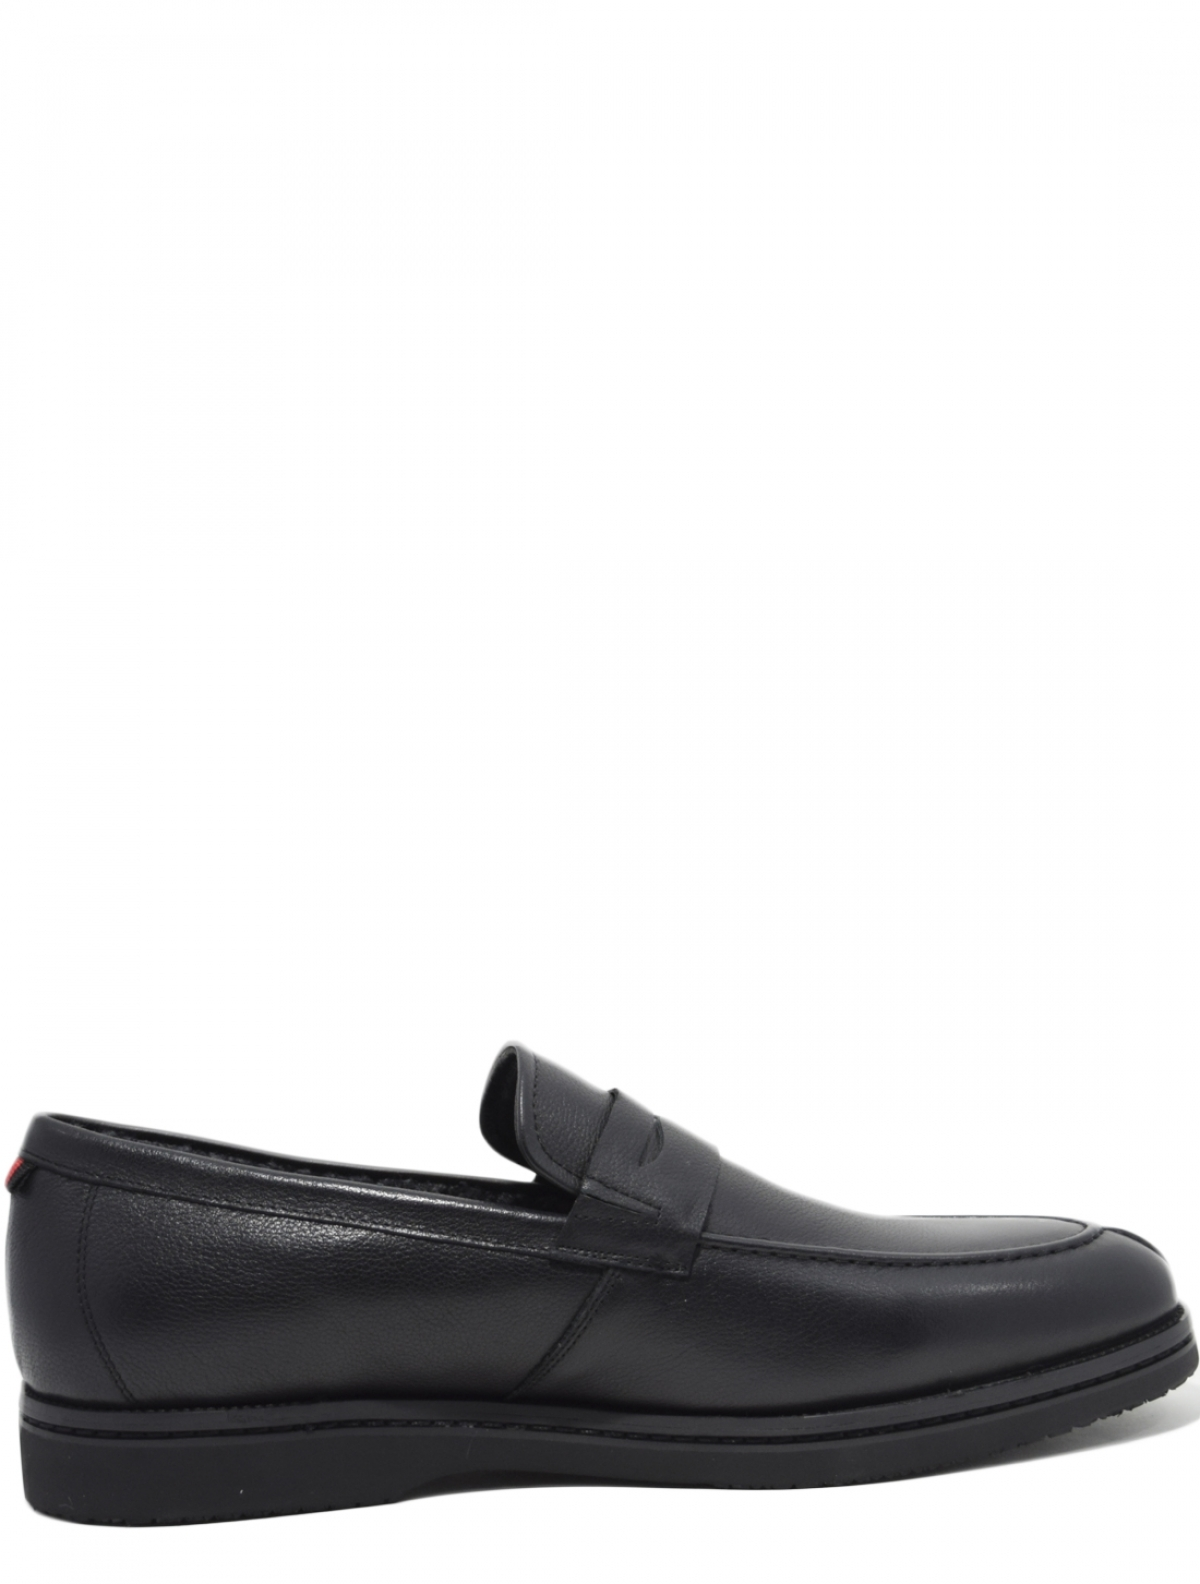 Roscote 803210M-T01-T7358D мужские туфли